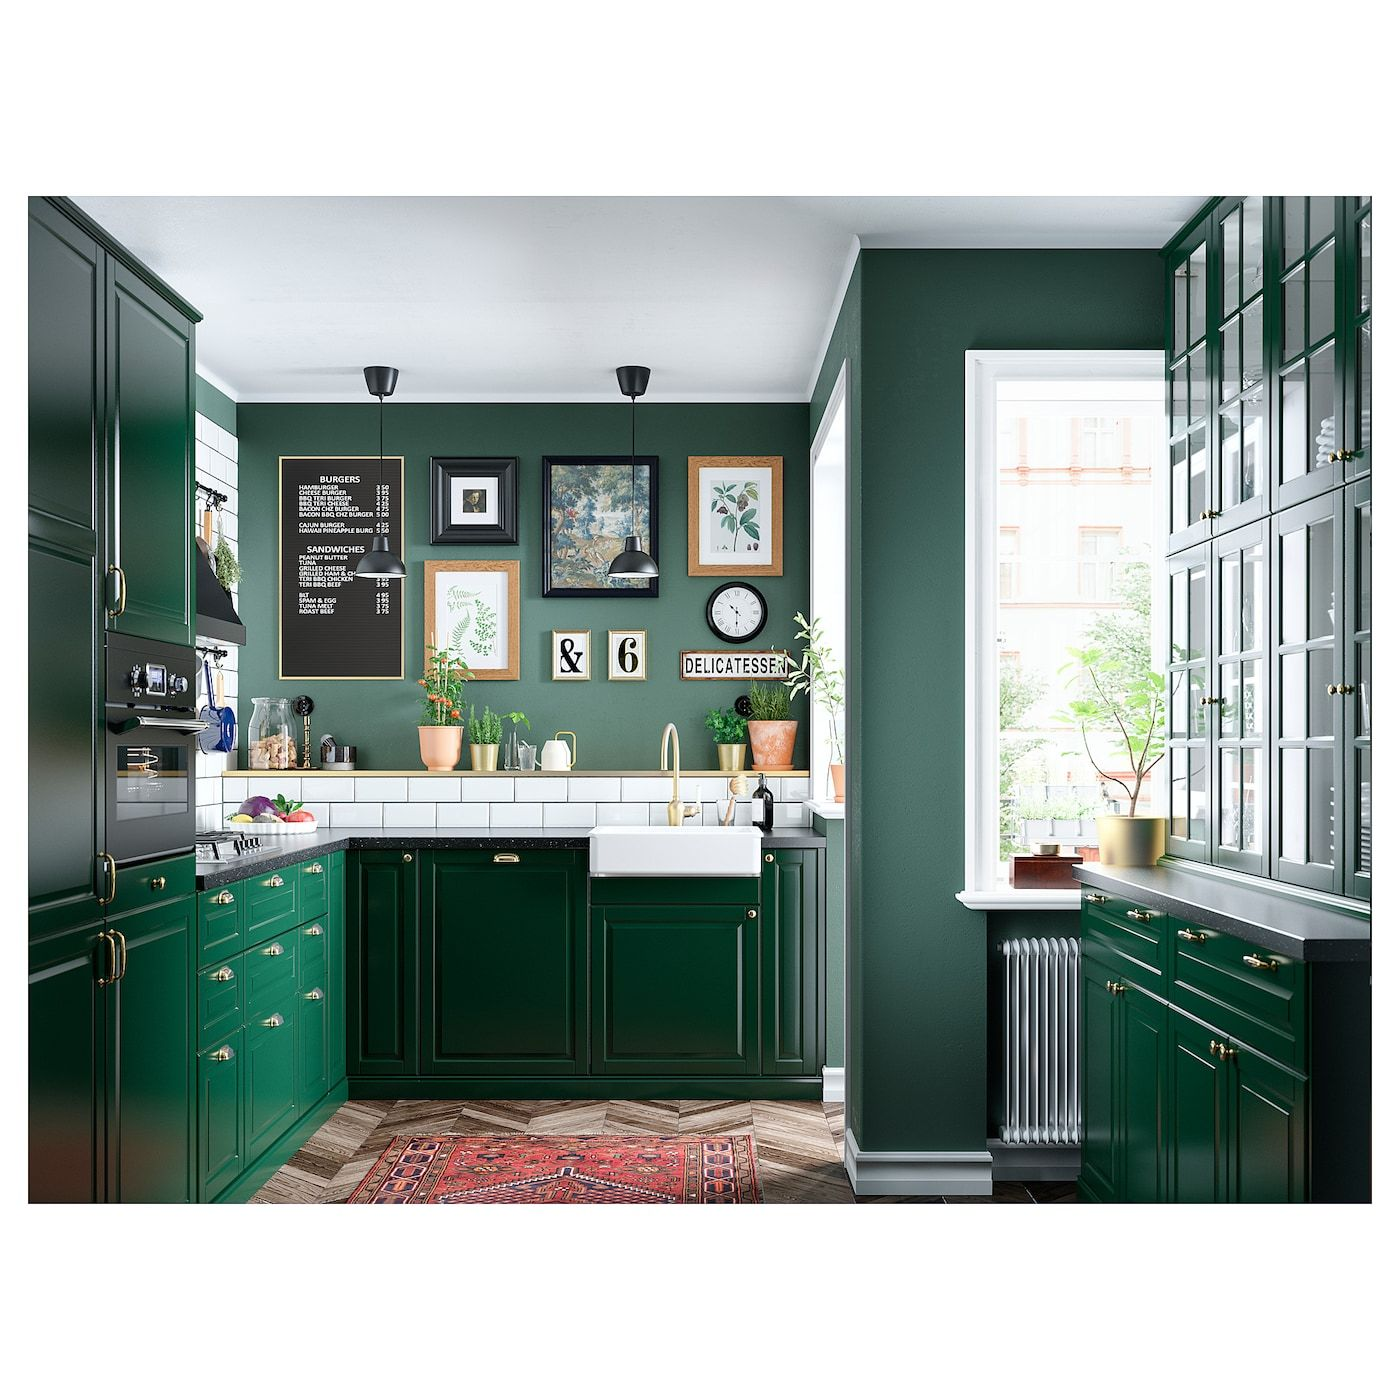 Saljan Countertop Black Mineral Effect Laminate 98x1 1 2 Ikea In 2020 Ikea Bodbyn Kitchen Dark Green Kitchen Green Kitchen Cabinets